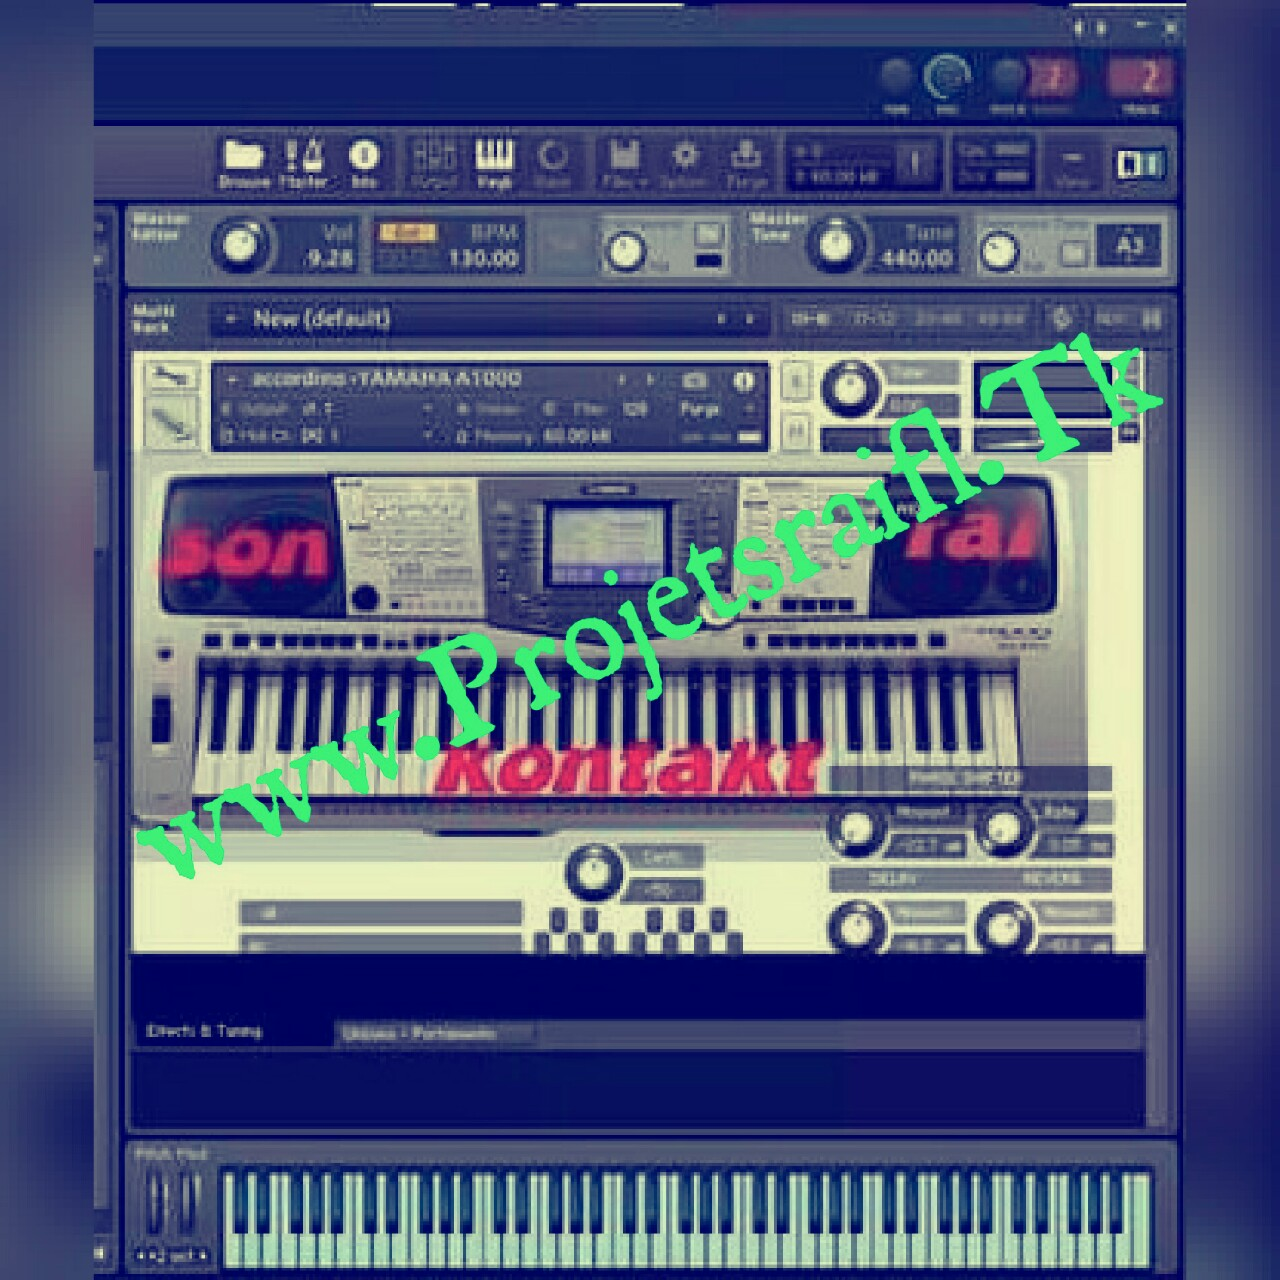 kontakt 5 fl studio 12 rai